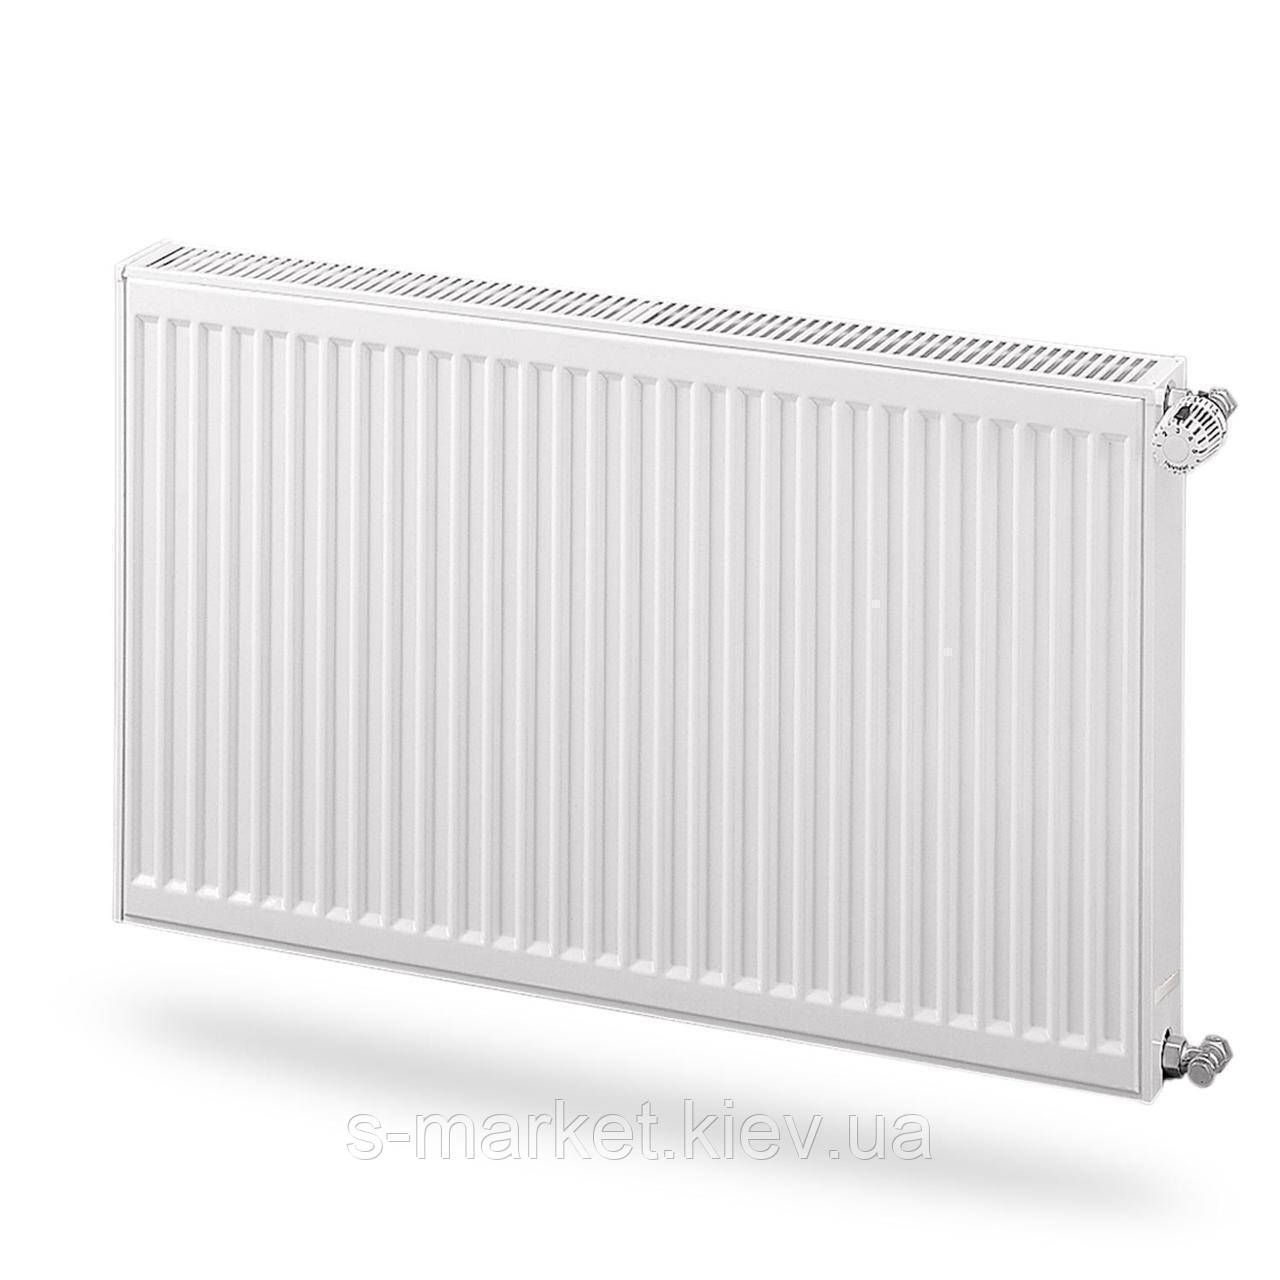 Радиатор Purmo Compact 11 тип 500х1000